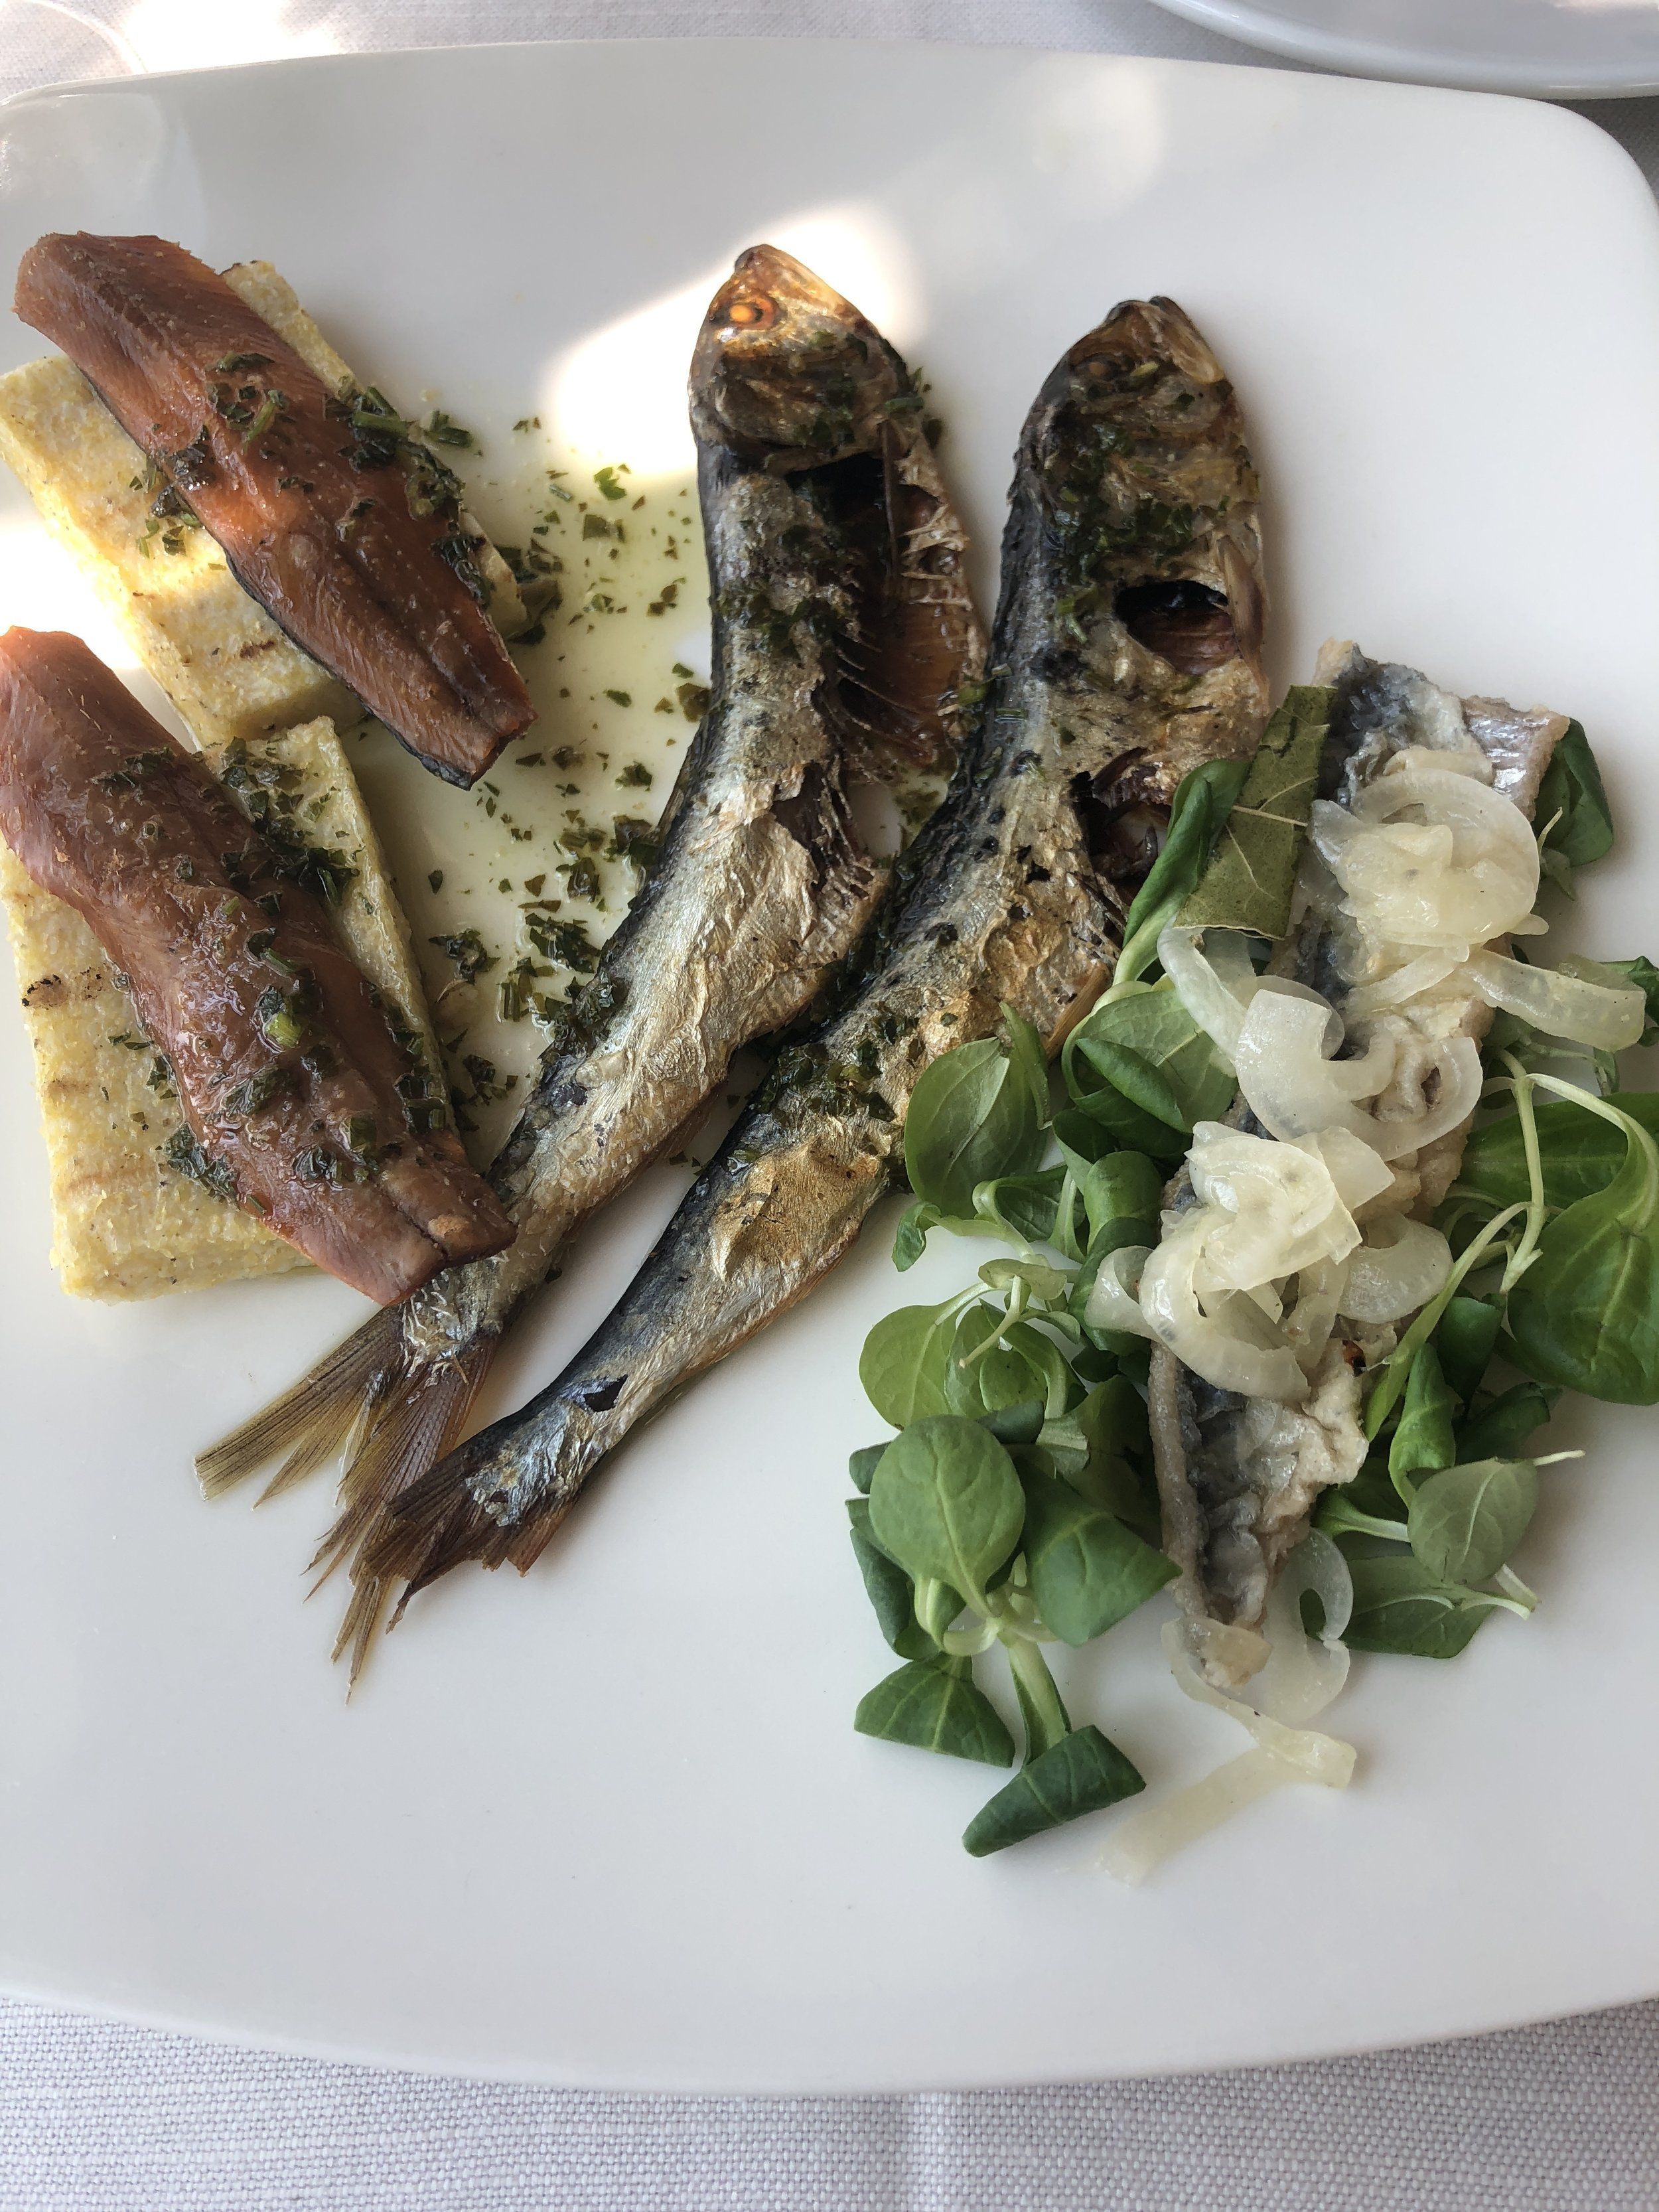 sardine platter.JPG